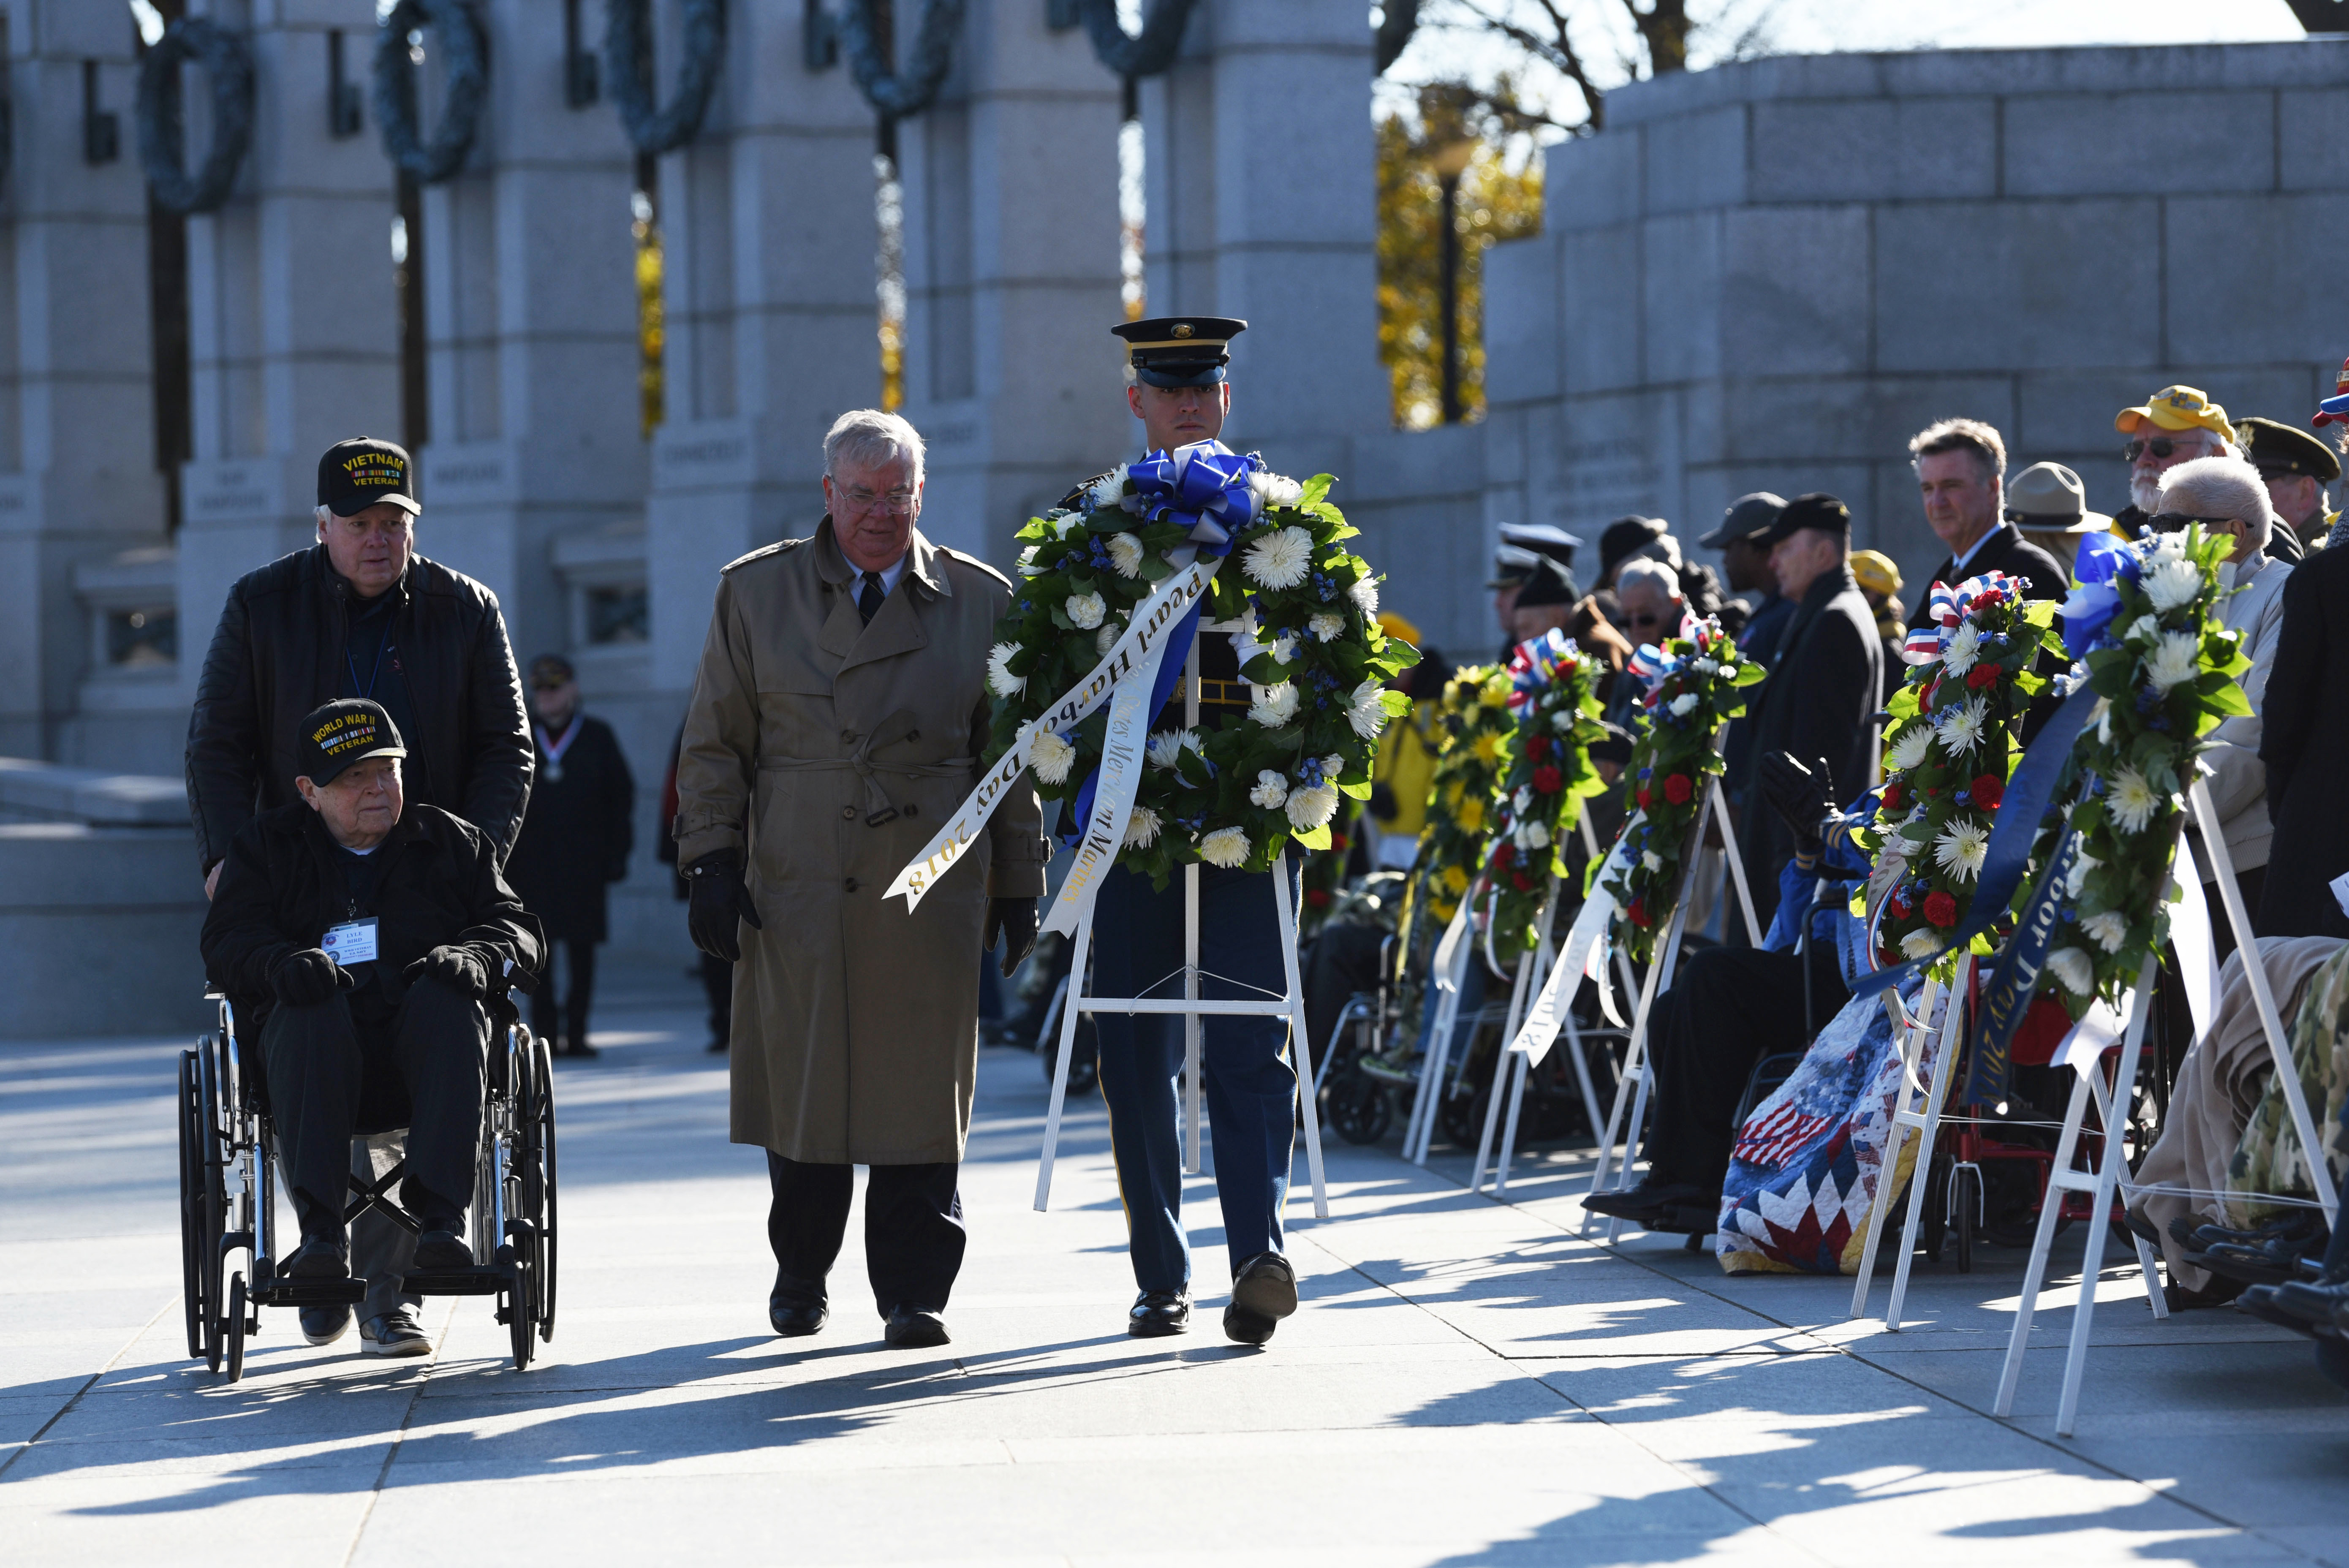 veteran at wreath ceremony in Washington on Pearl Harbor day